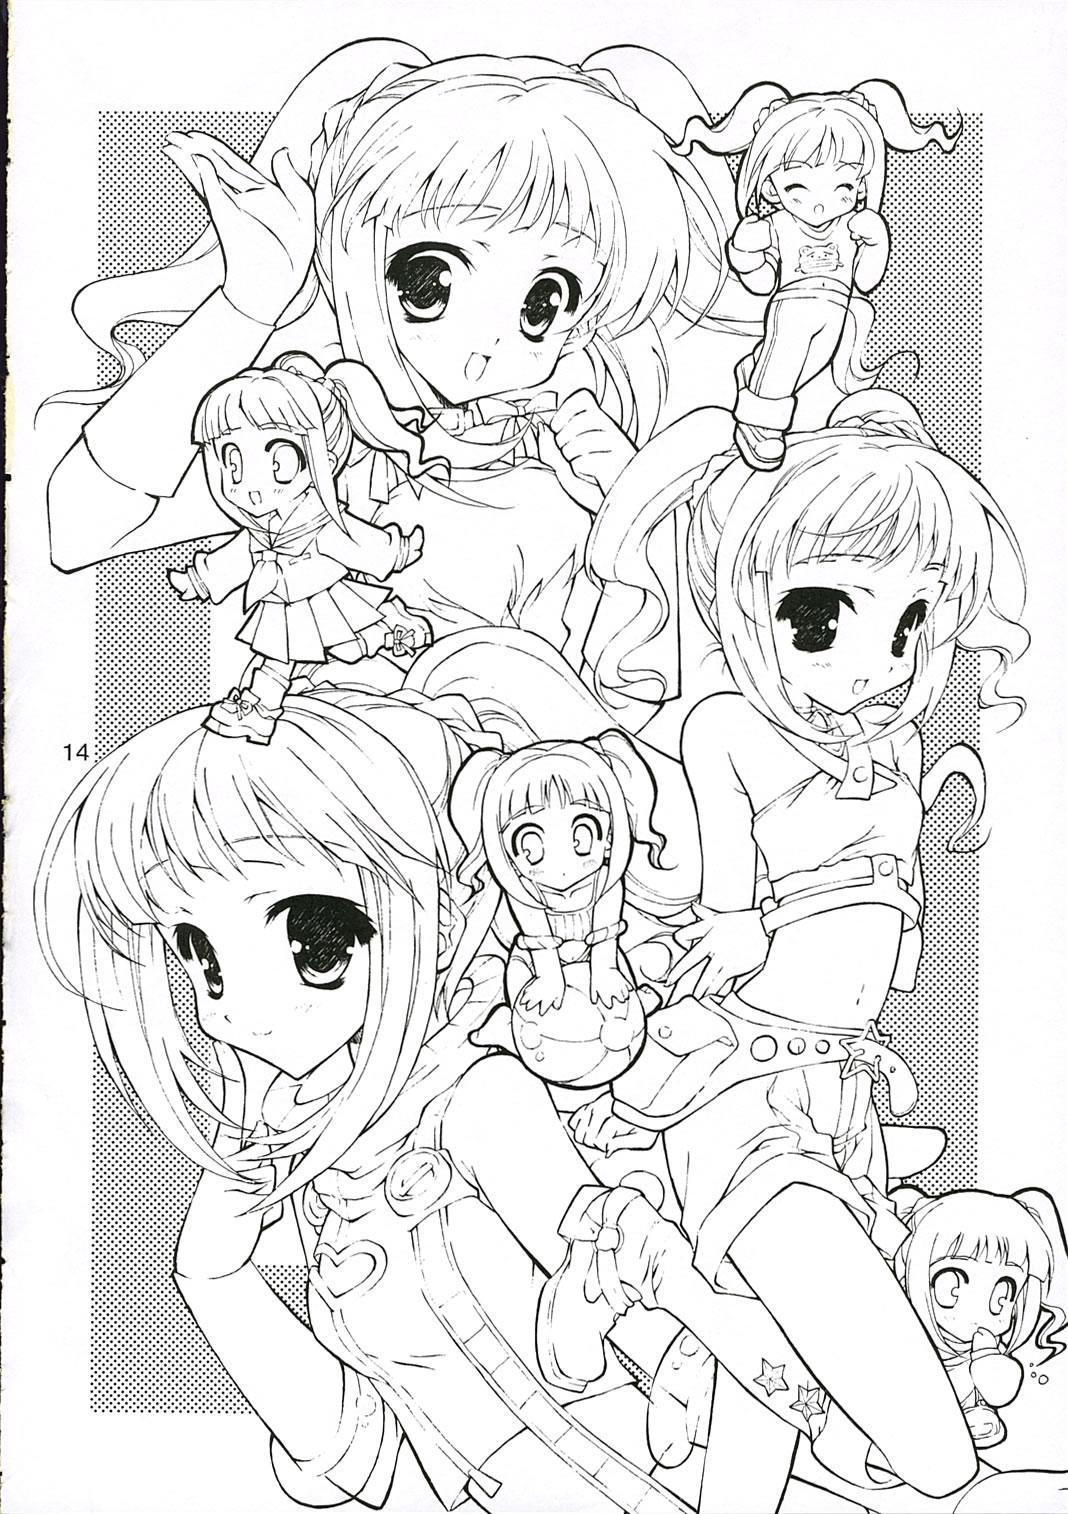 Oshiete Heart no Katachi 12